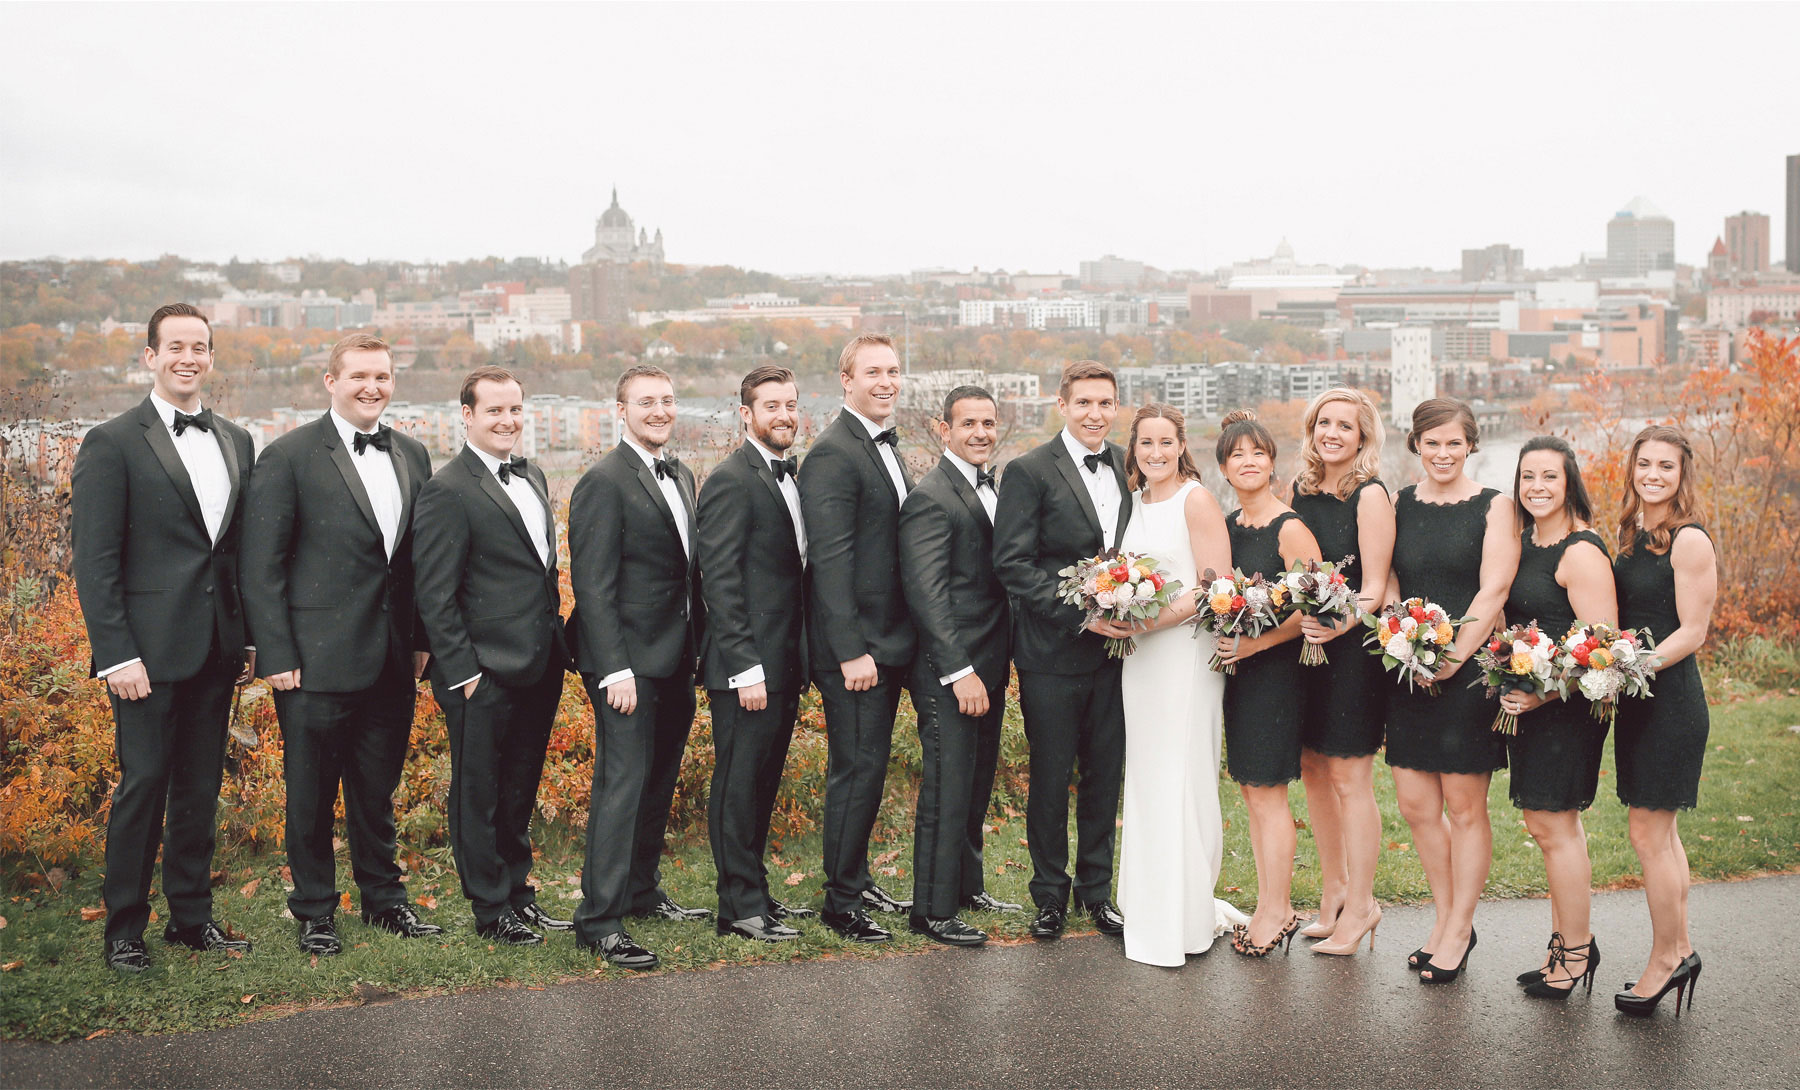 13-Saint-Paul-Minnesota-Wedding-Photographer-by-Andrew-Vick-Photography-Fall-Autumn-Bride-Groom-Bridal-Party-Groomsmen-Bridesmaids-Flowers-Skyline-Vintage-Kathryn-and-Sam.jpg